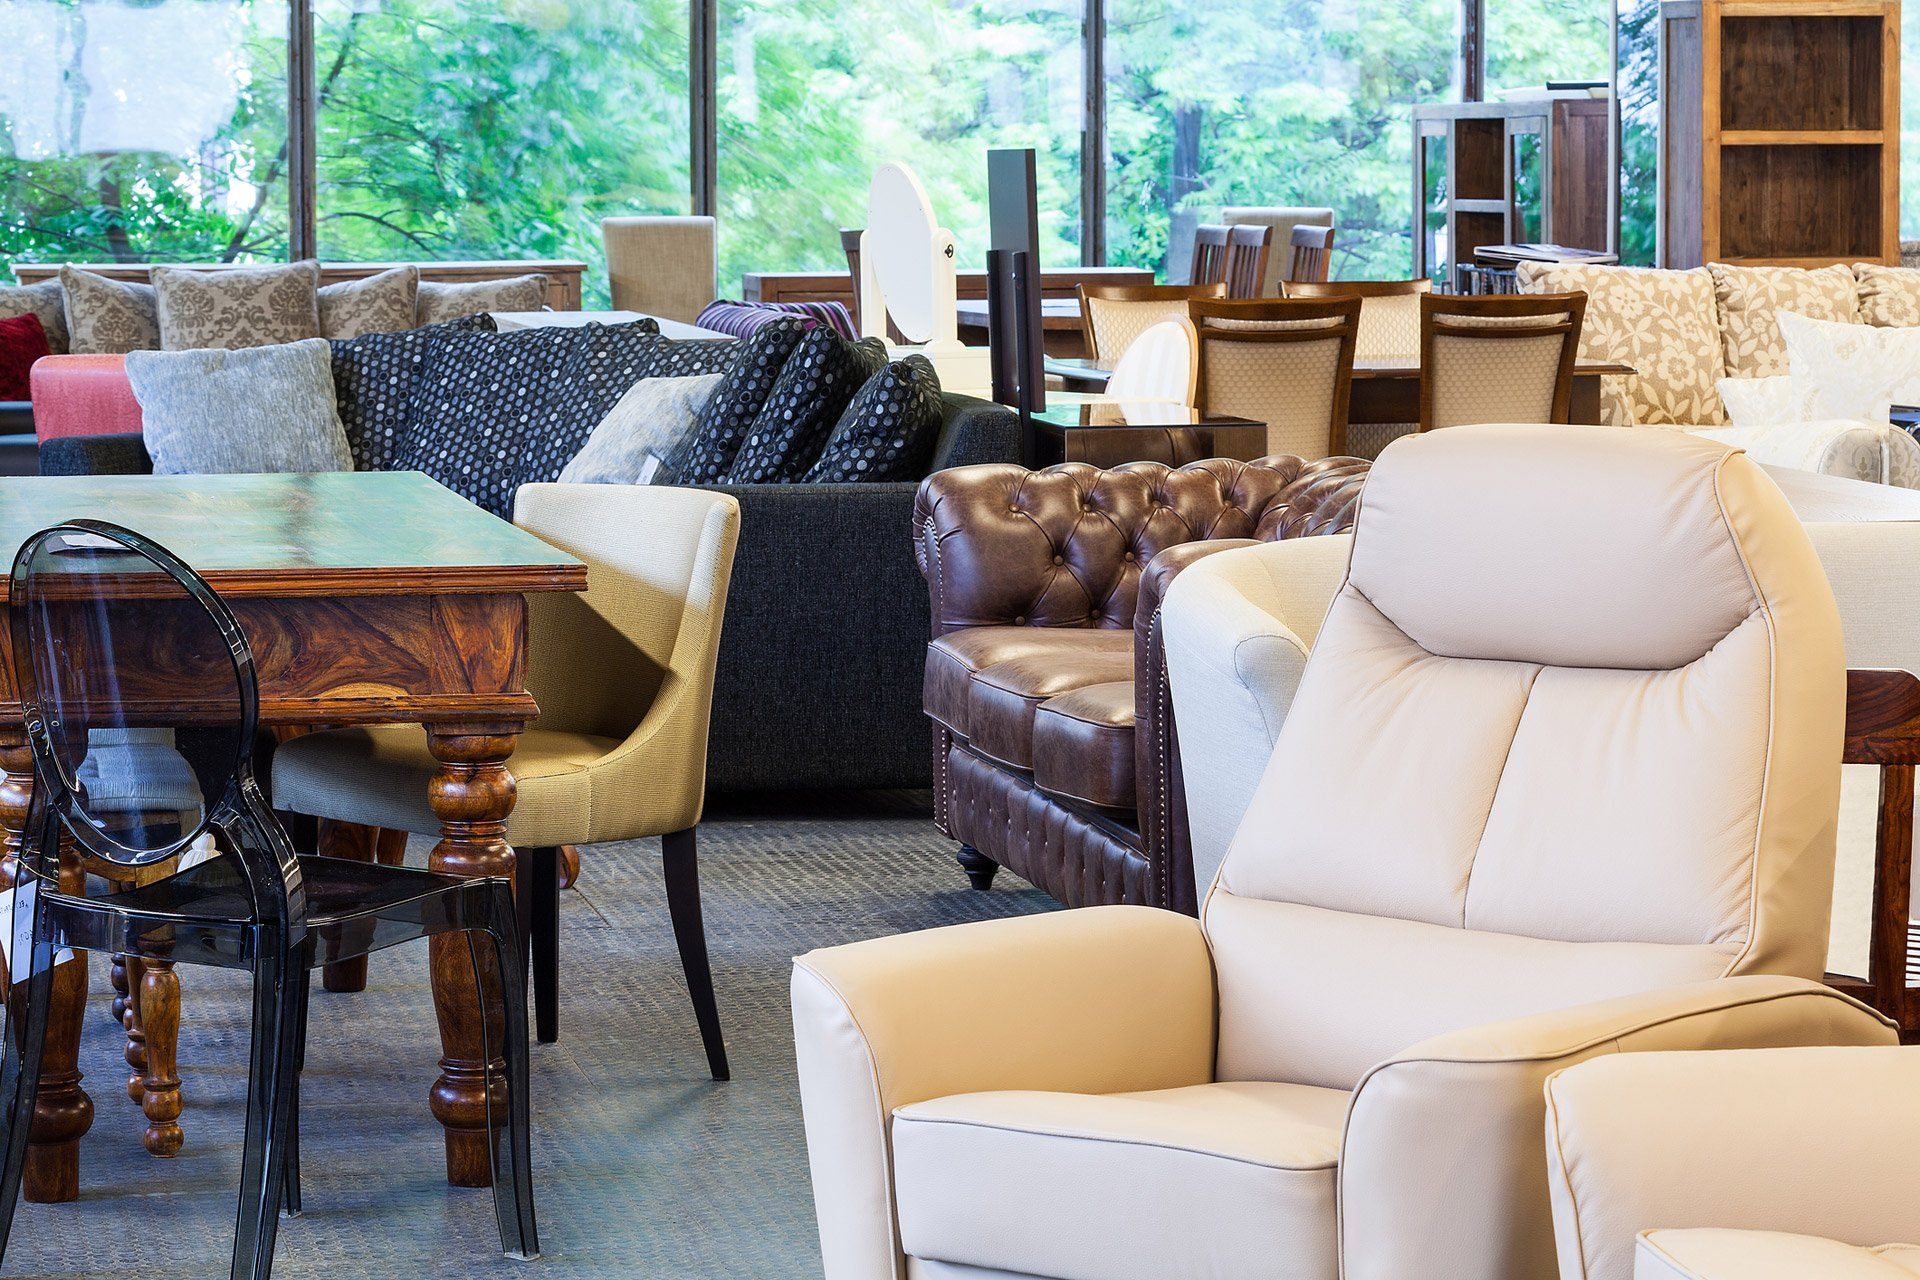 Superb Consignment Furniture Dallas, TX